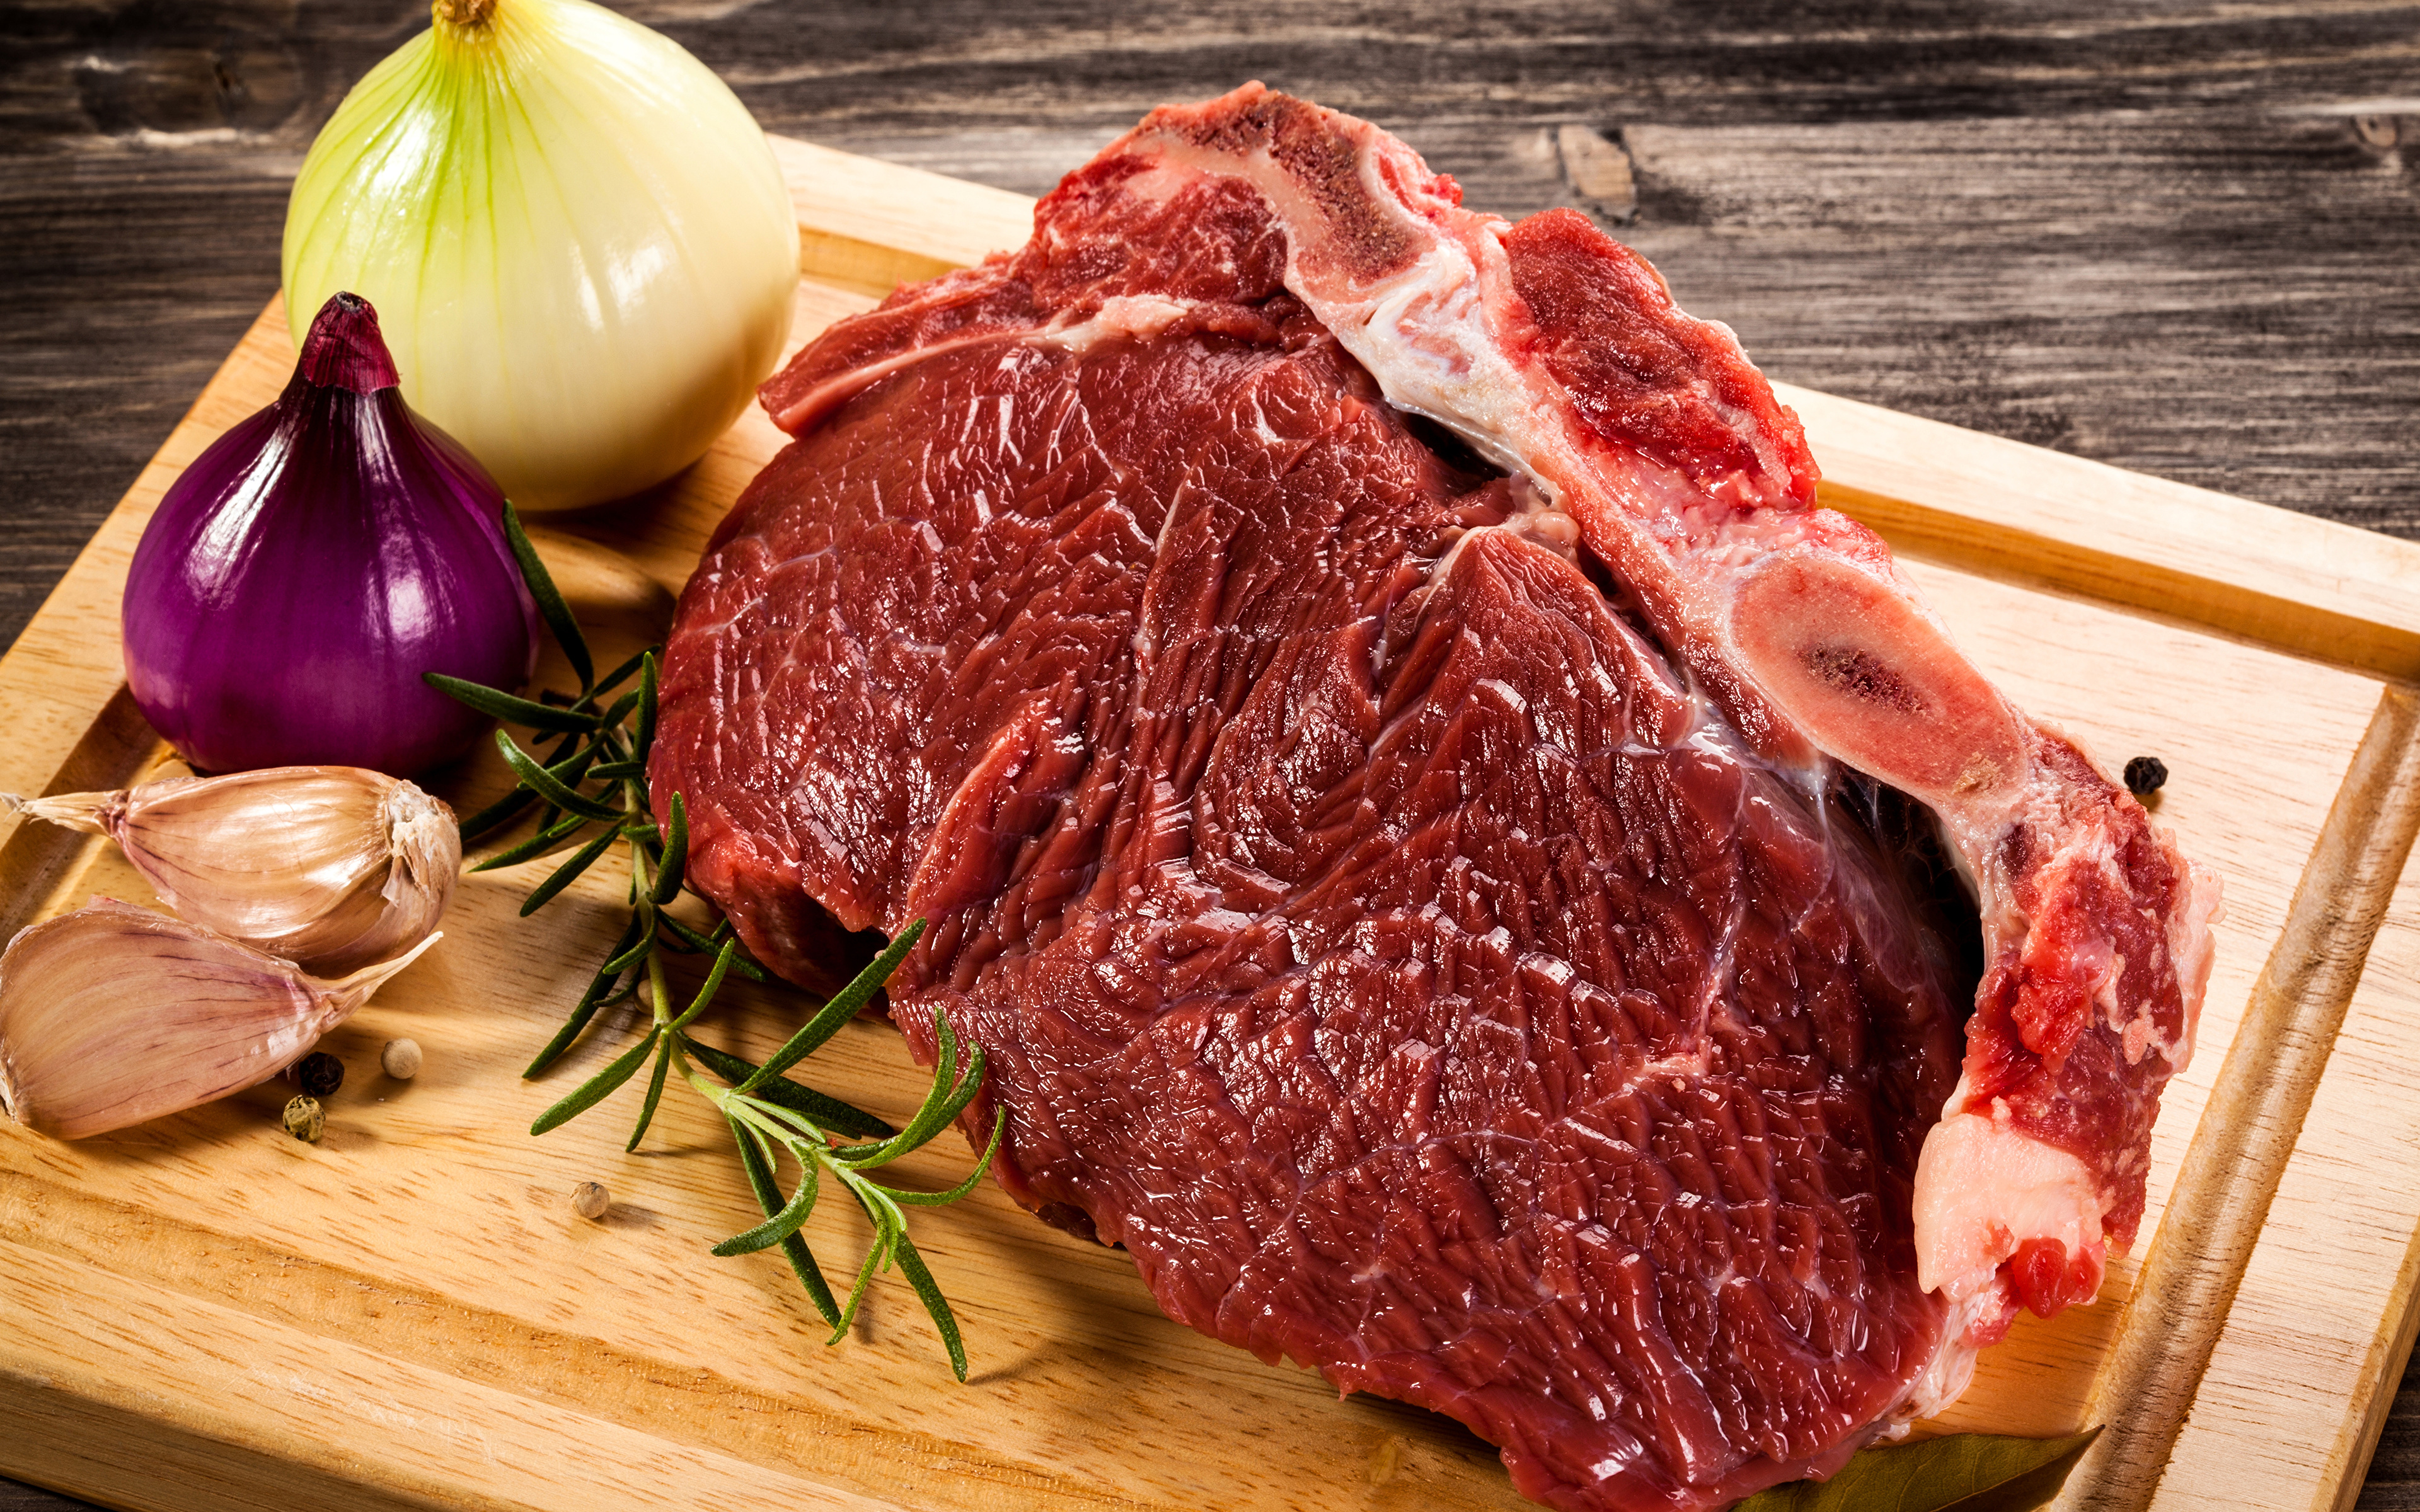 Сонник резать мясо во сне сырое